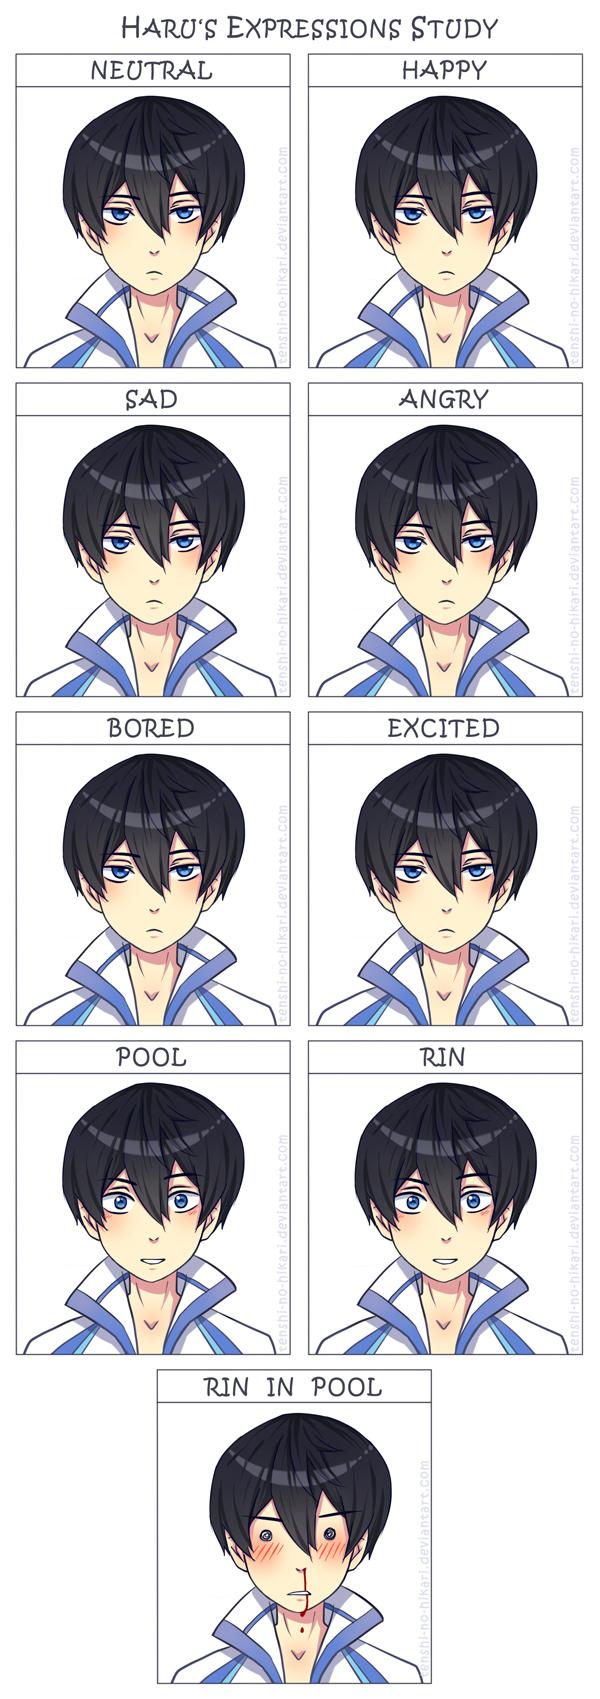 Free - Haru's expressions study by Tenshi-no-Hikari